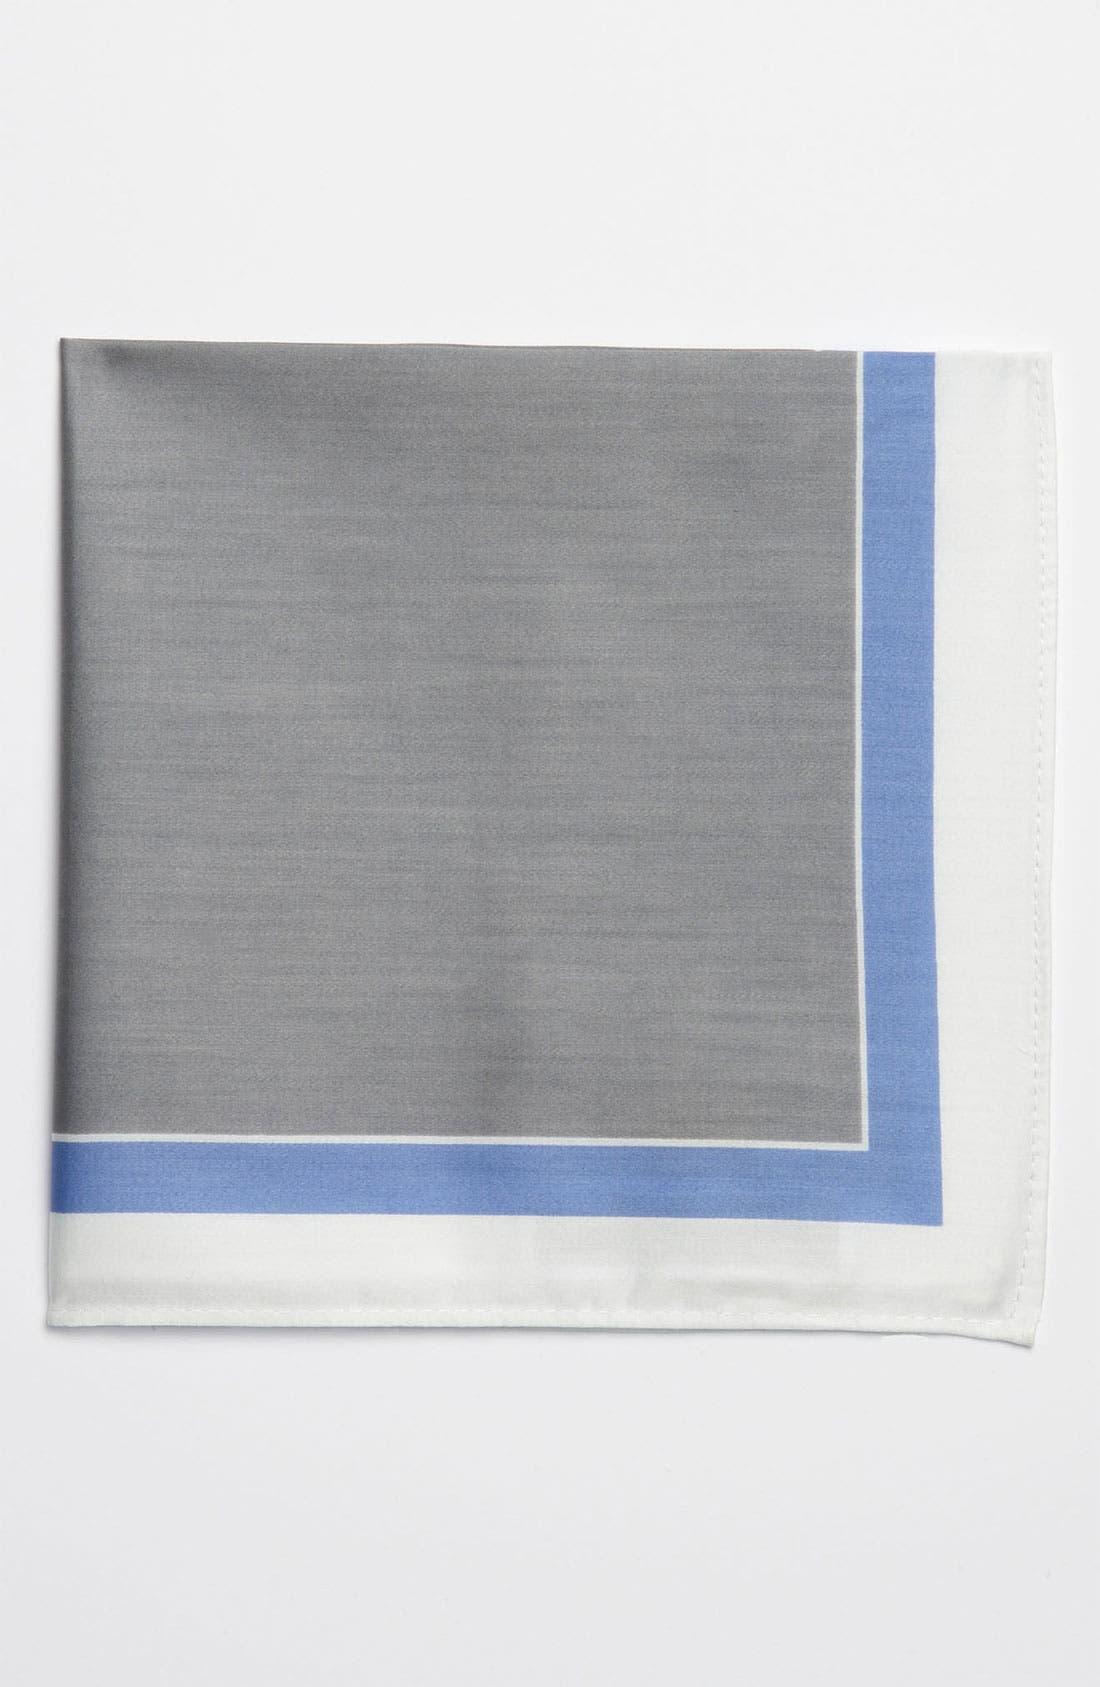 Alternate Image 1 Selected - Michael Kors Border Pocket Square